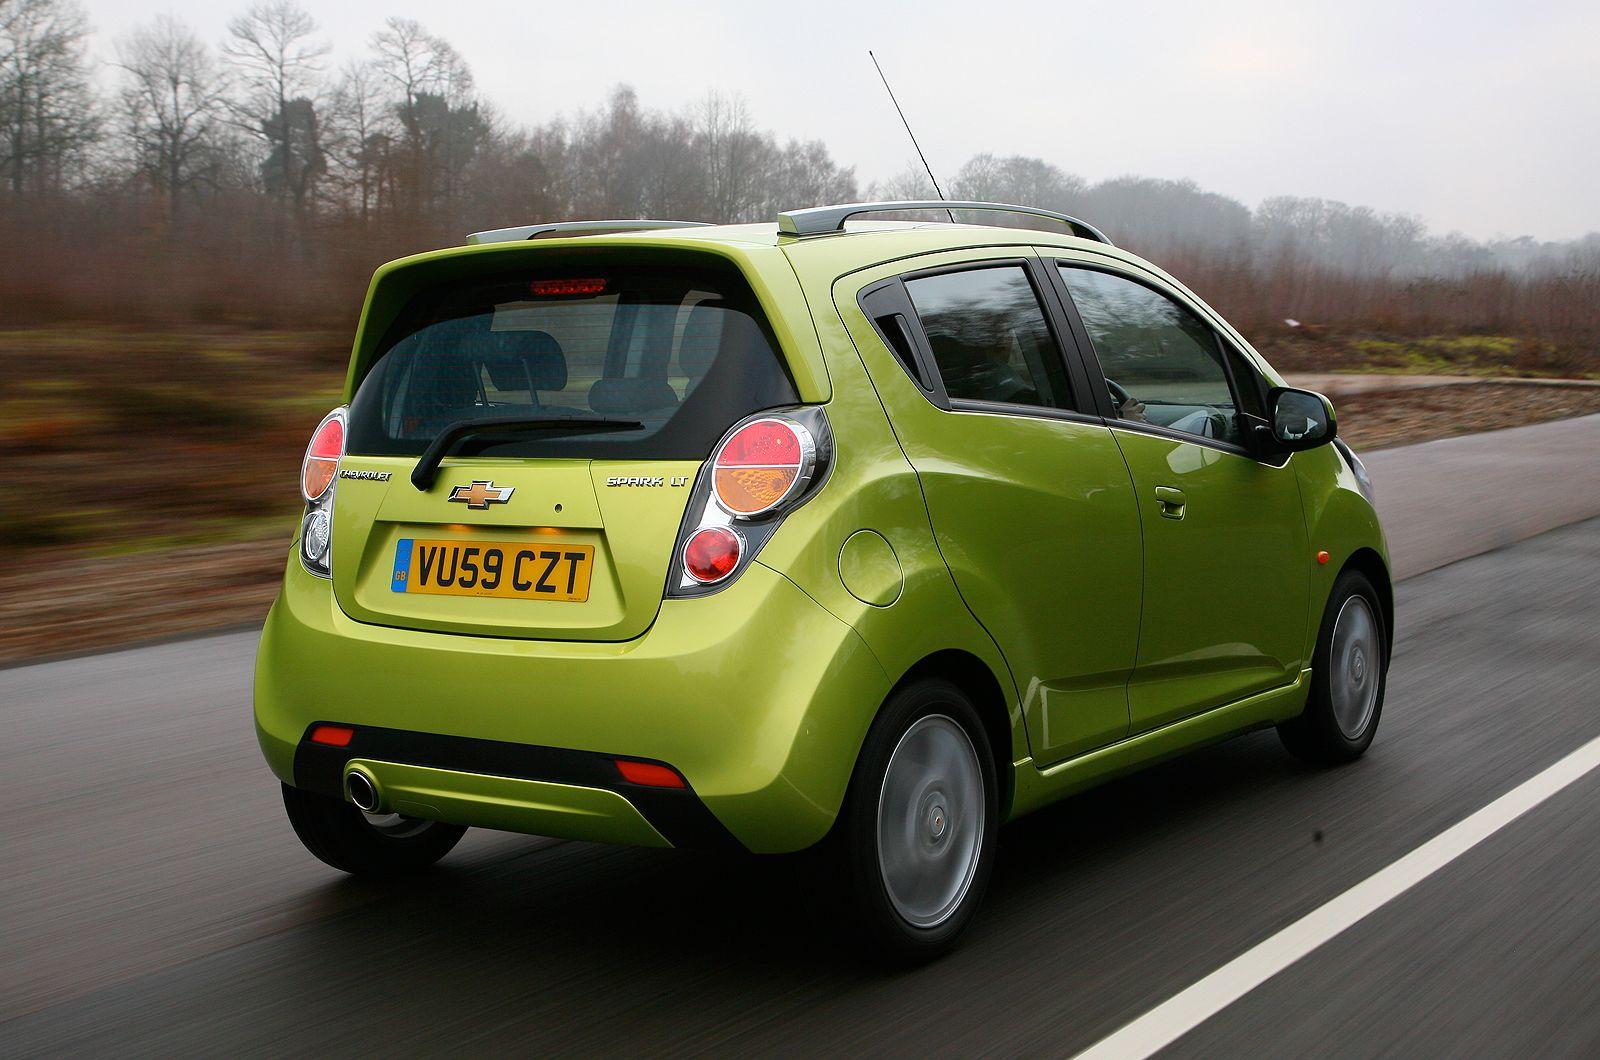 Chevrolet Spark Gas Mileage Car Picture